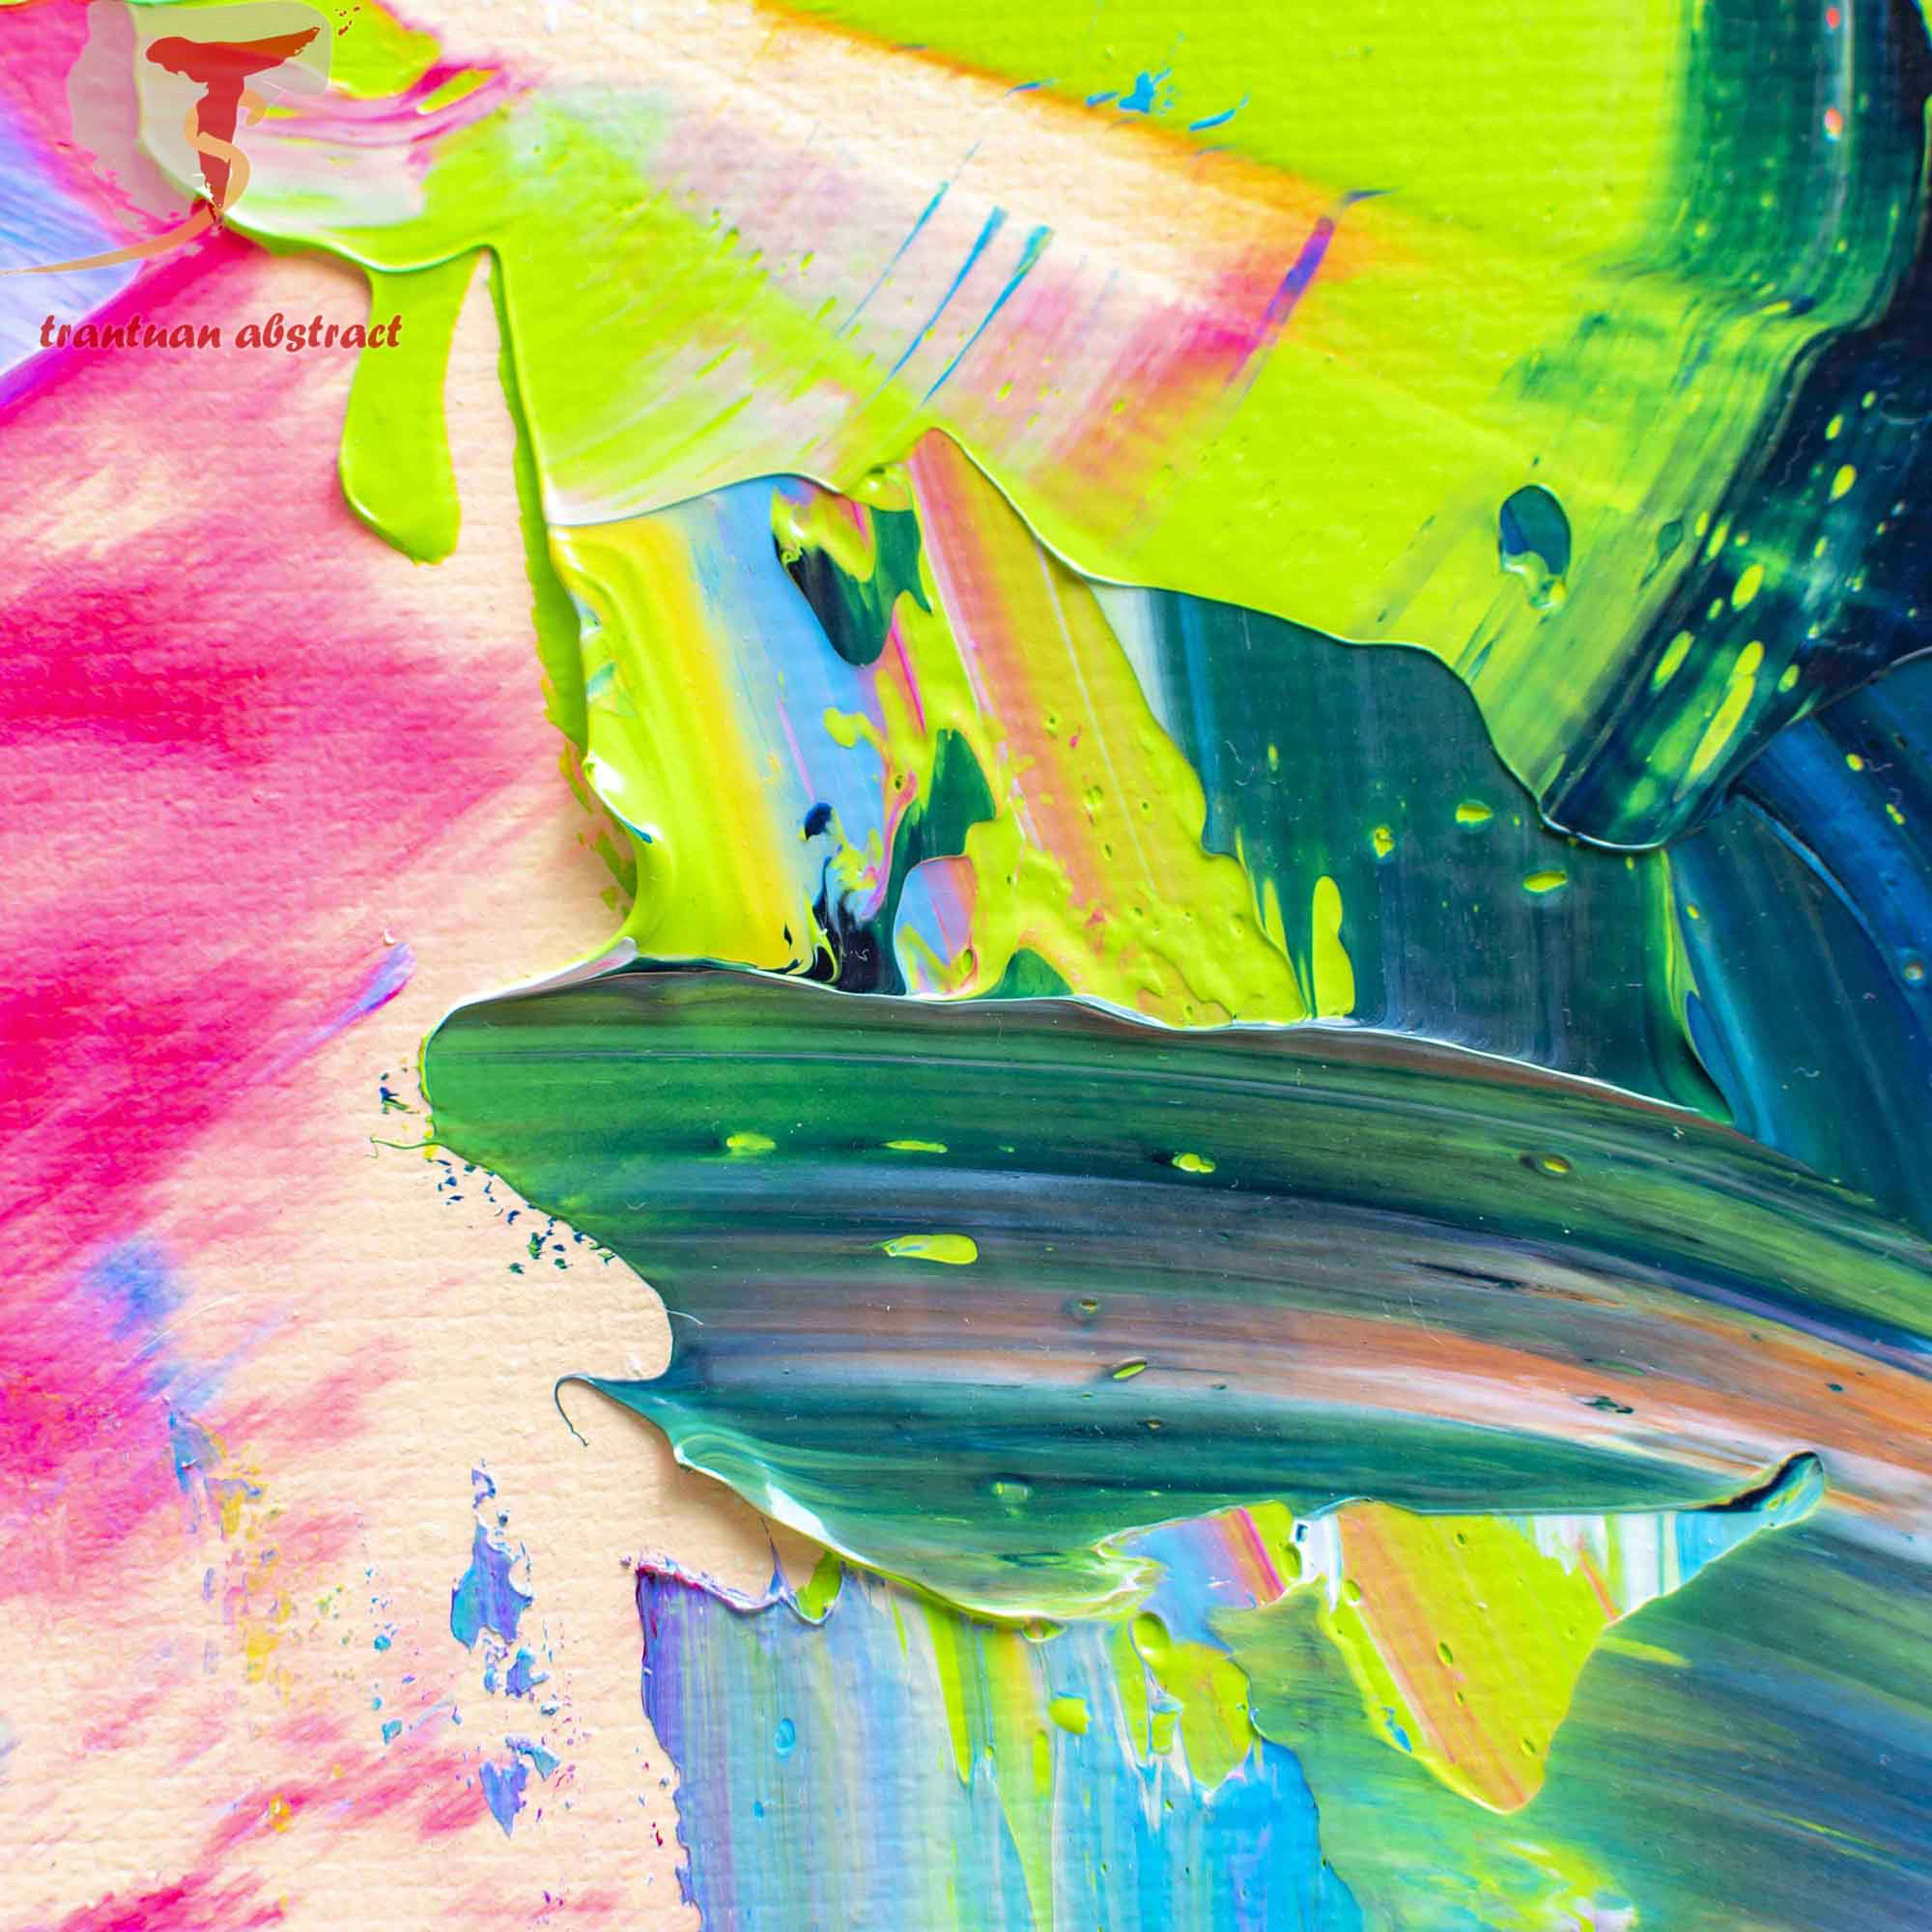 Tran Tuan Artist Coastal City at Night 2021 135 x 80 x 5 cm Acrylic on Canvas Painting Detail s (22)